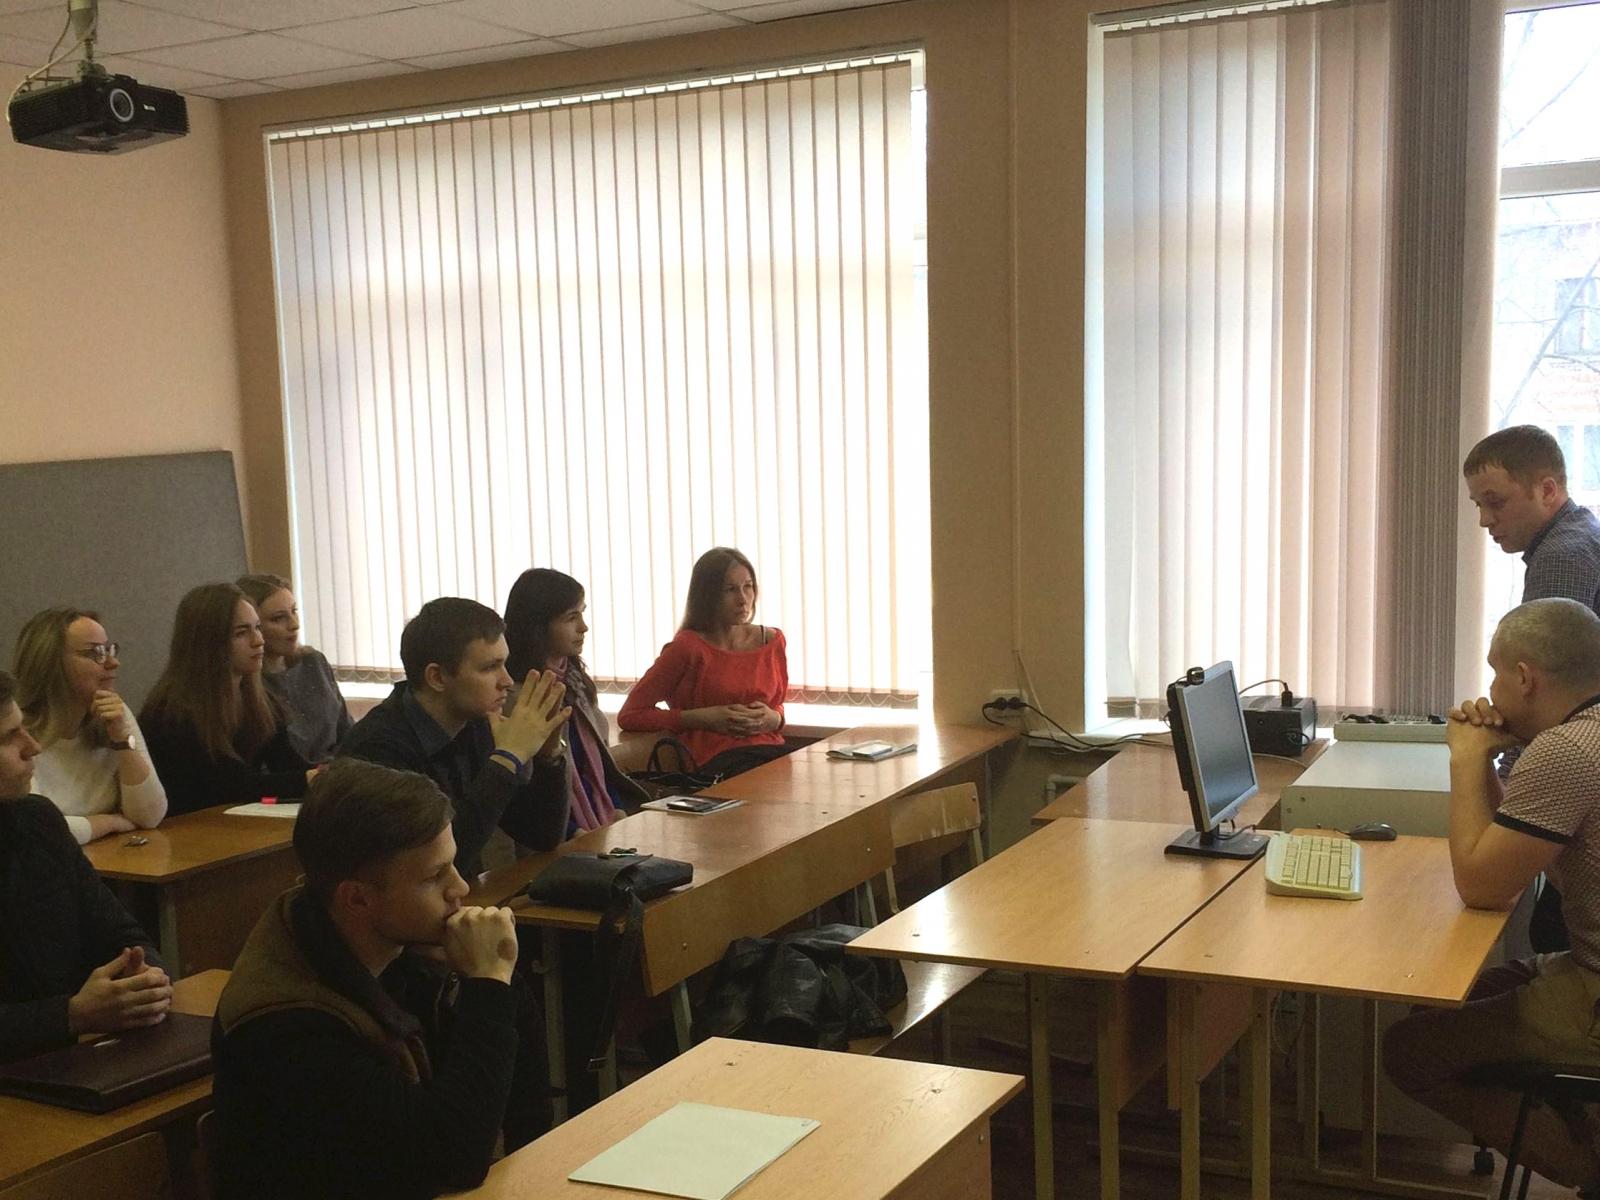 Выпускники ВШПМиЭ встретились со студентами